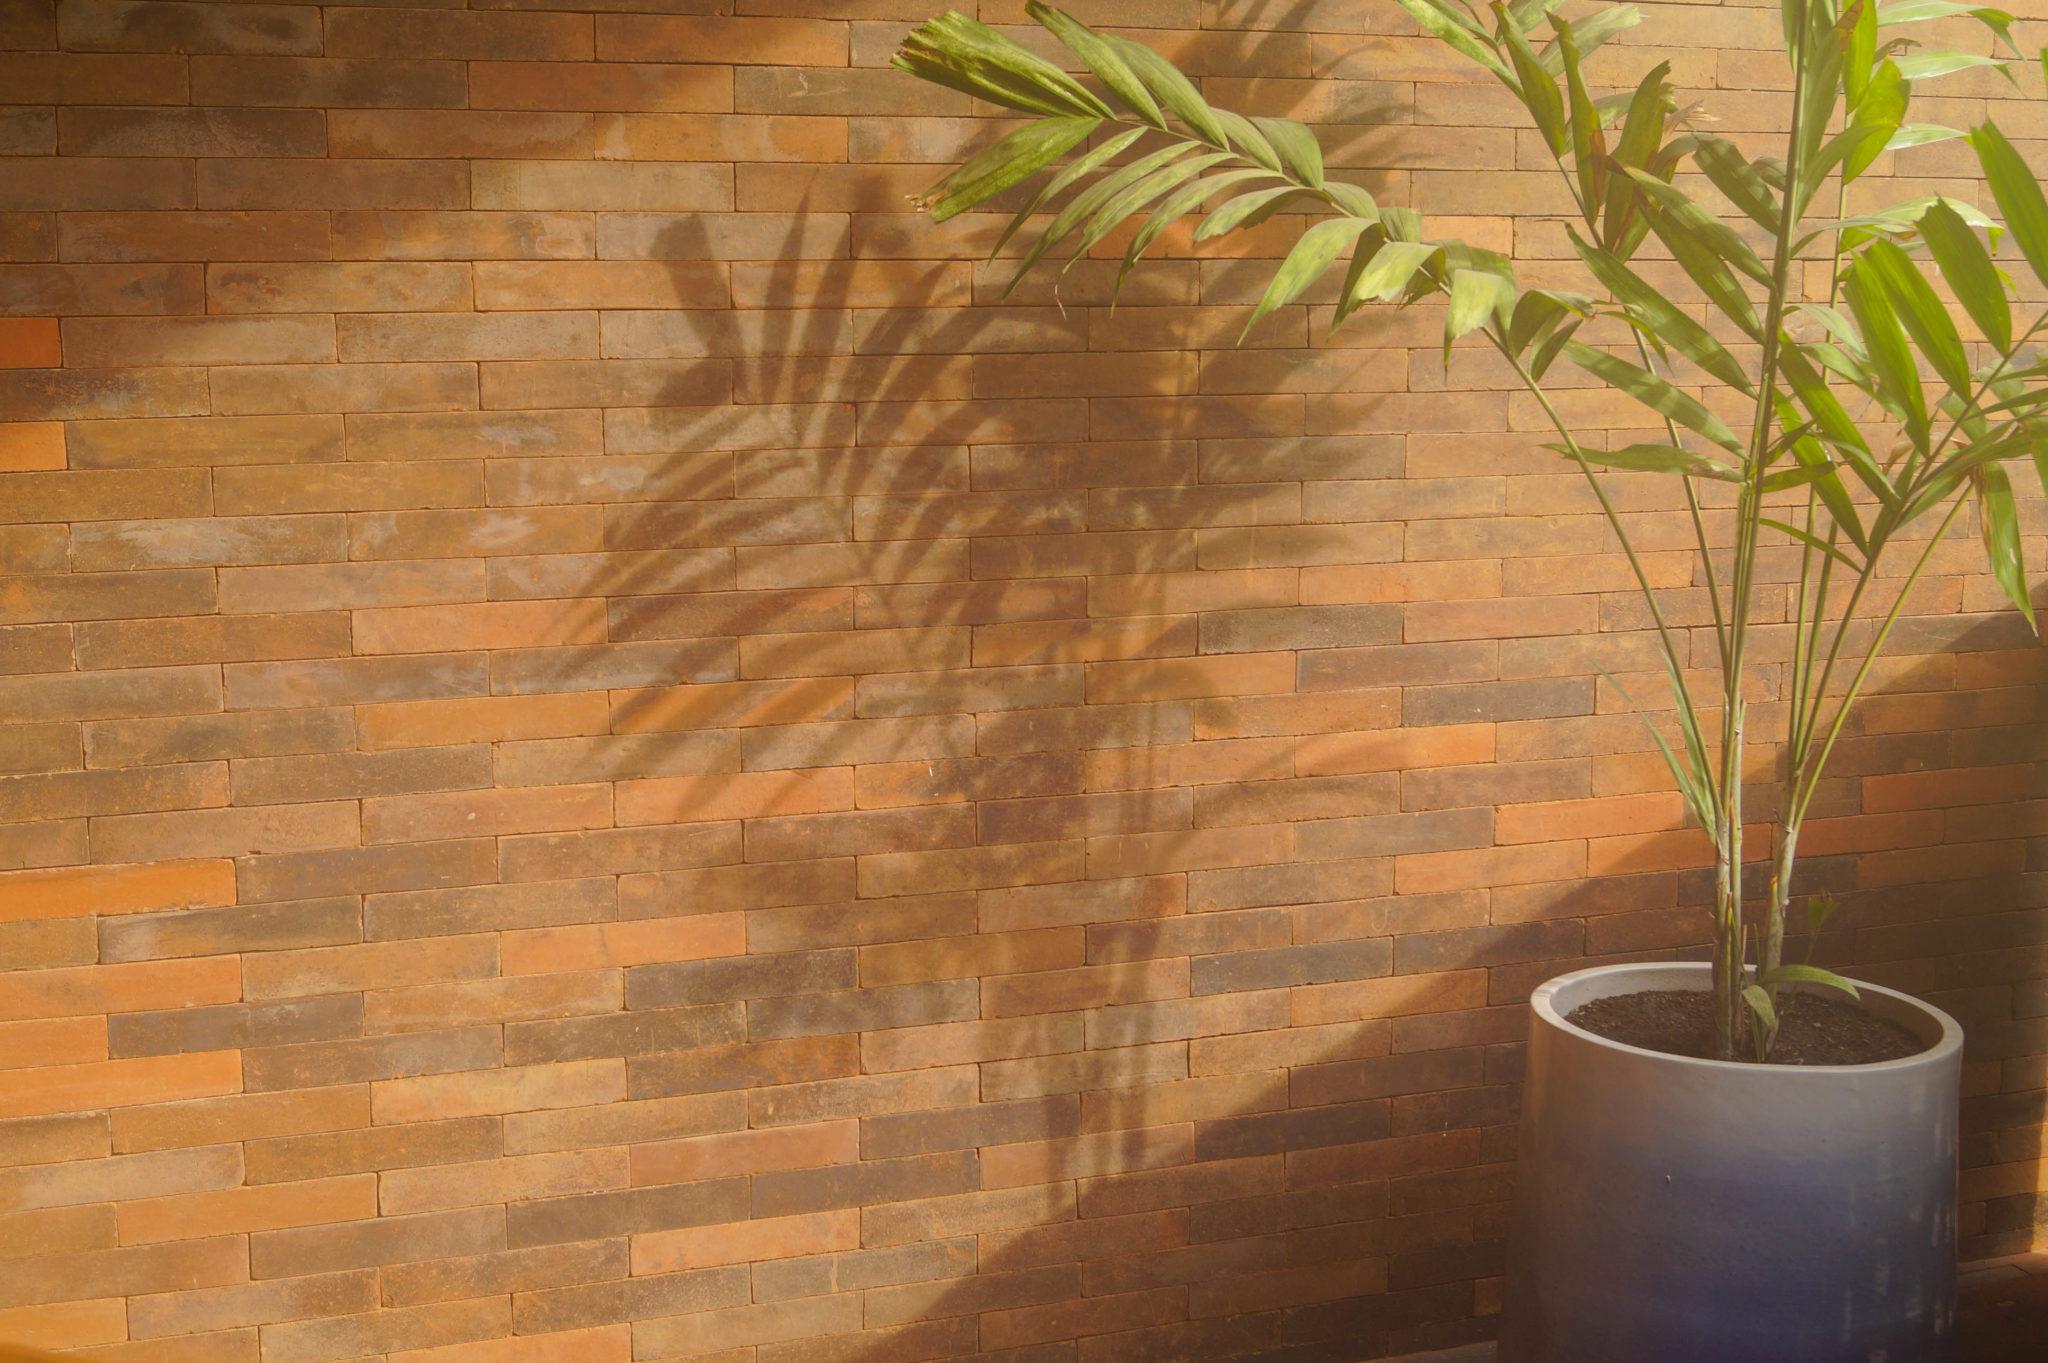 Katamama Hotel Bali: Bricks and palm trees, a perfect match.